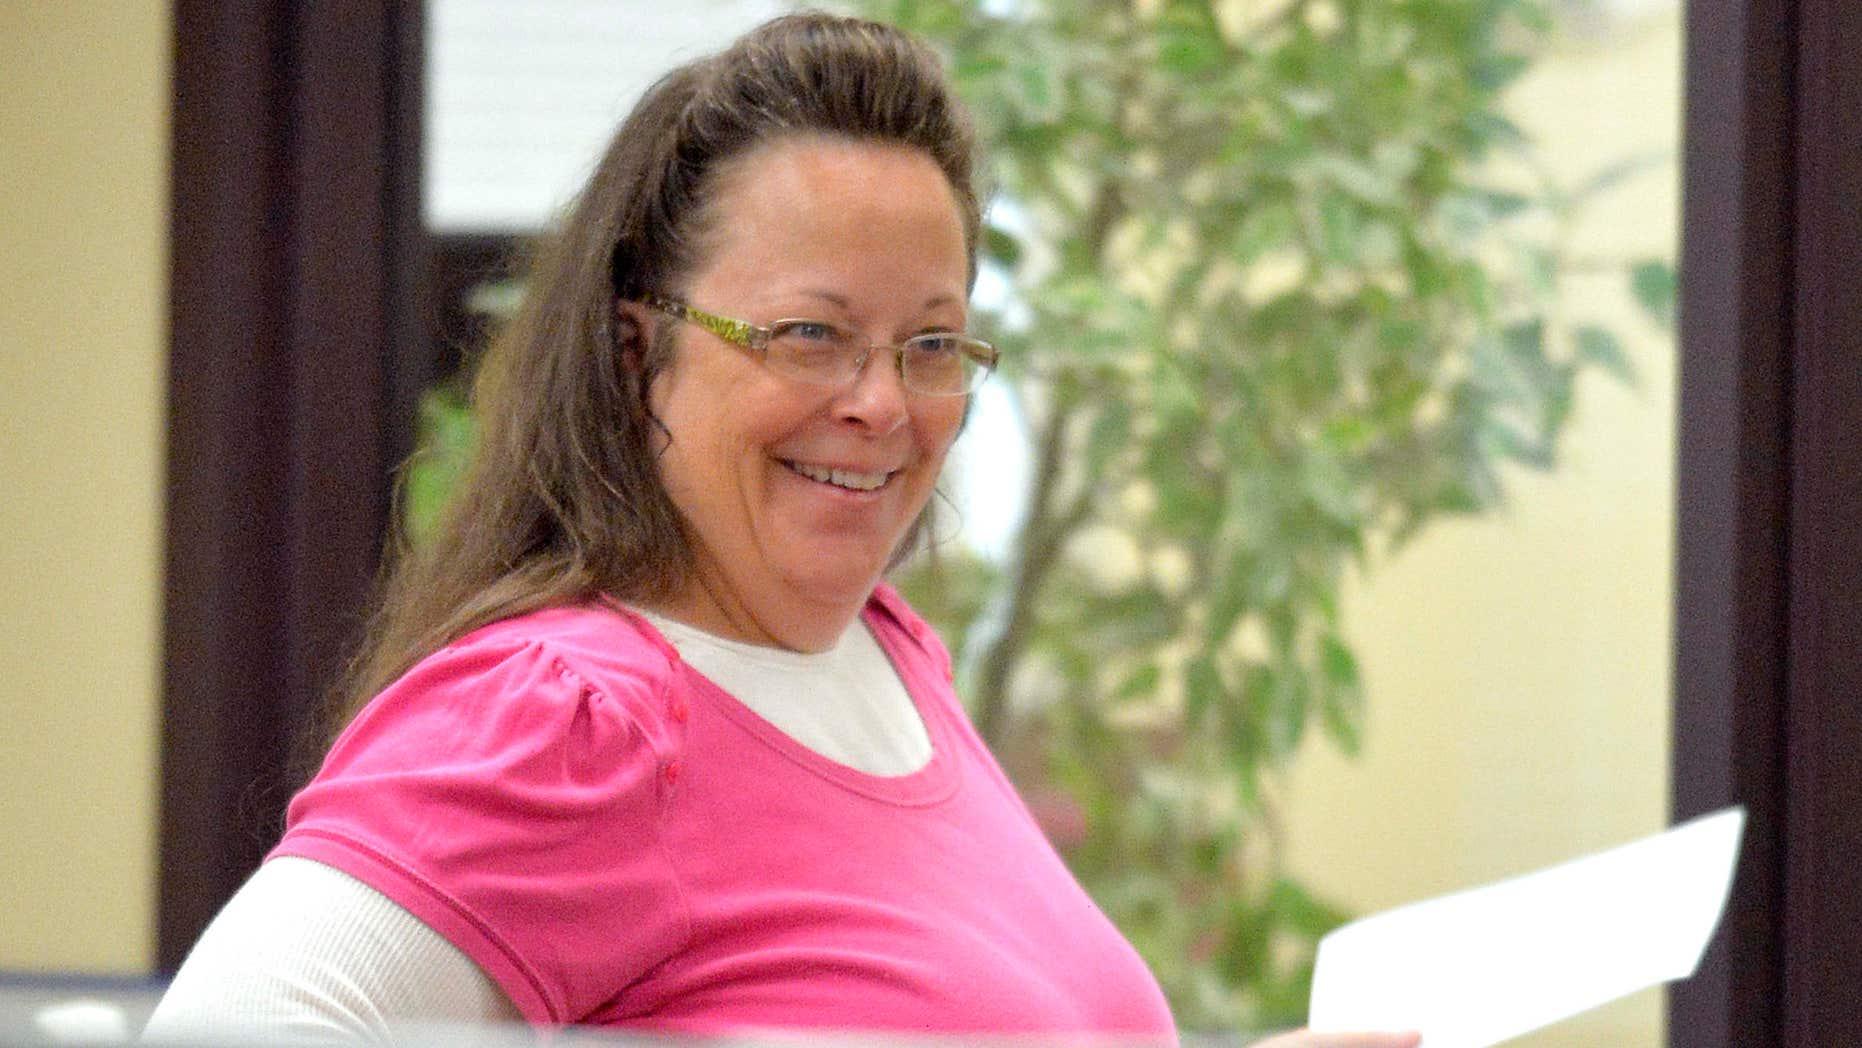 Aug. 18, 2015: Rowan County Clerk Kim Davis smilesas she helps a customer at the Rowan County Courthouse in Morehead, Ky.